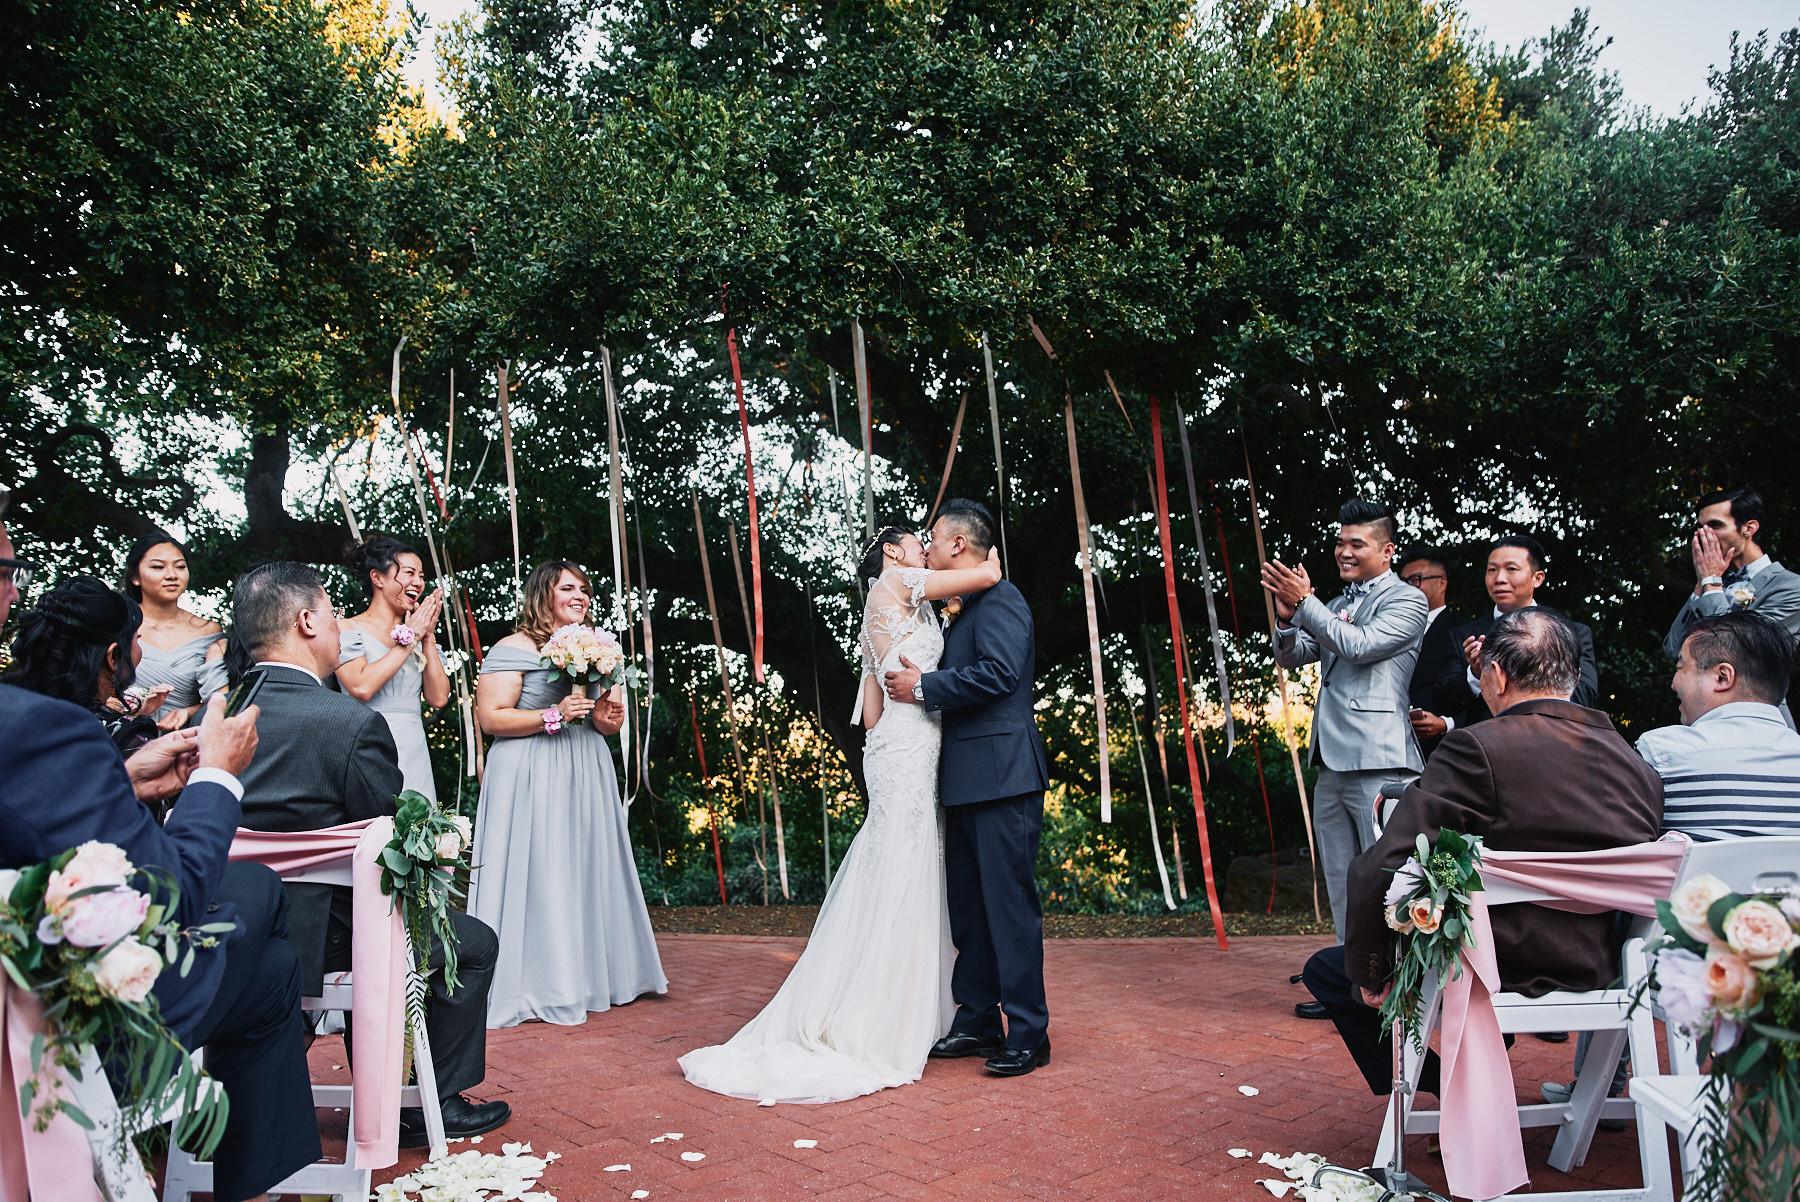 Quail Ranch wedding ceremony